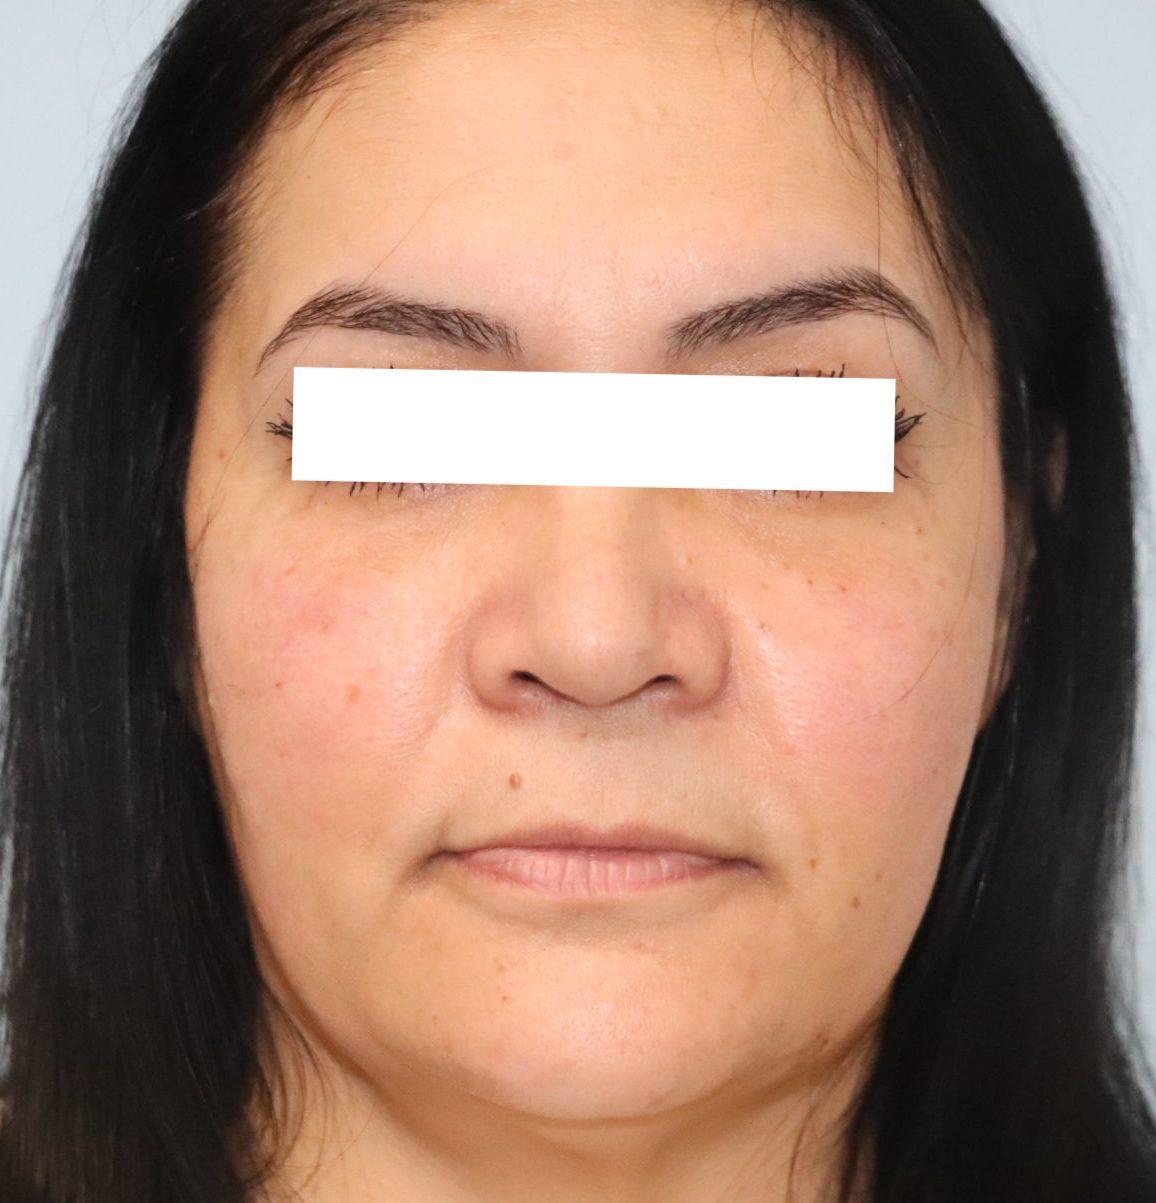 Lower Blepharoplasty after photo